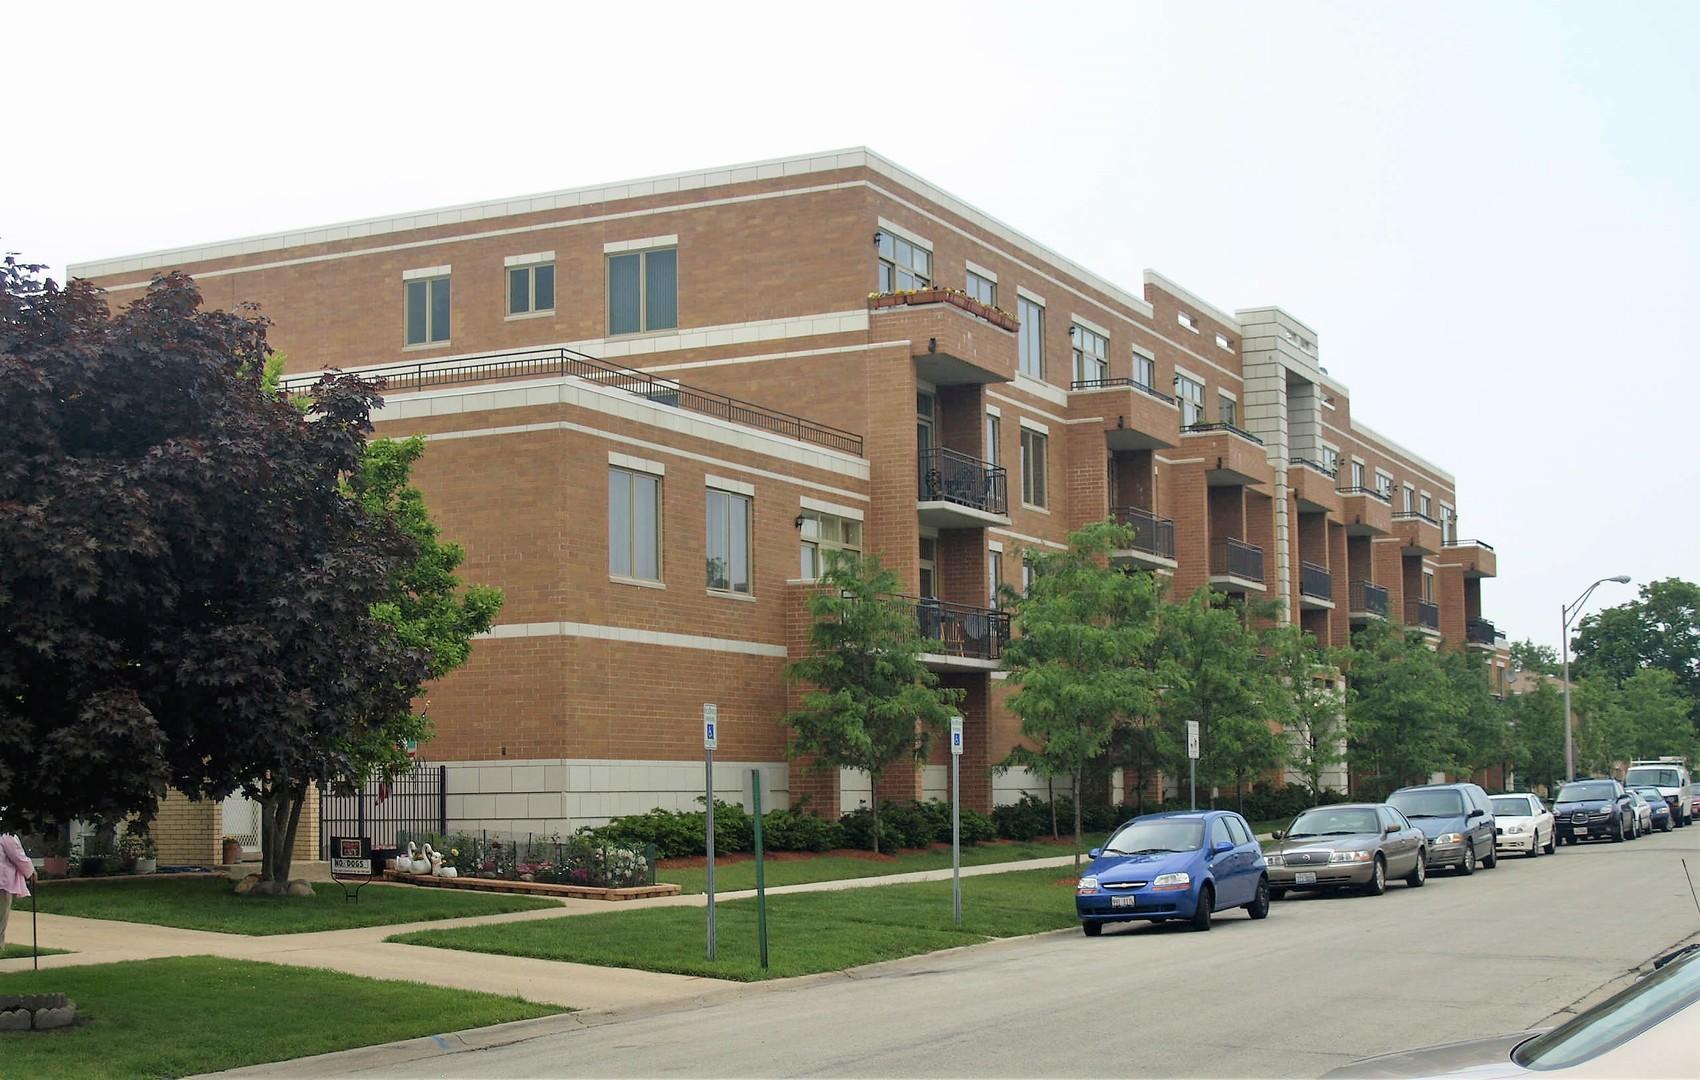 4330 Neva Unit Unit 403 ,Norridge, Illinois 60706